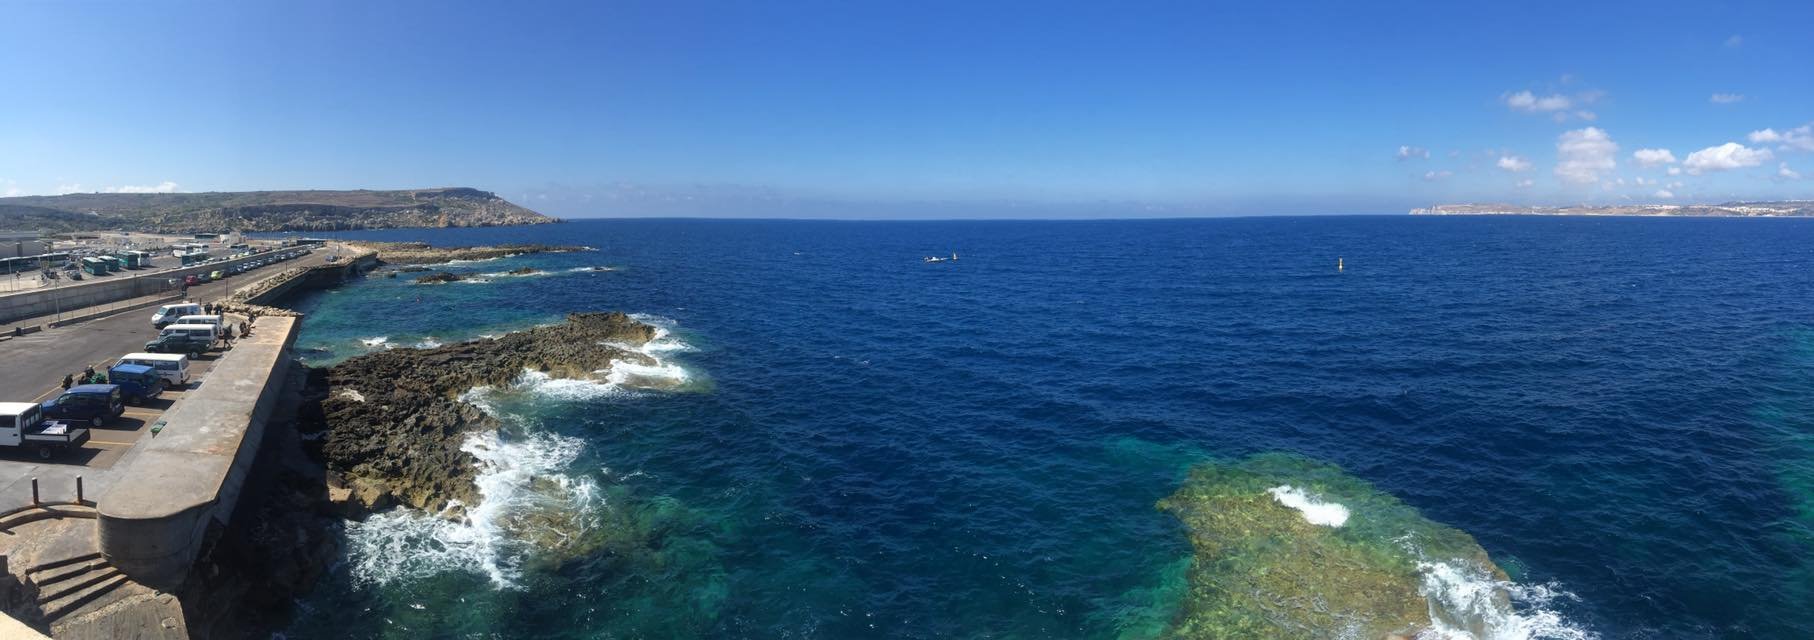 diving-malta-cirkewwa